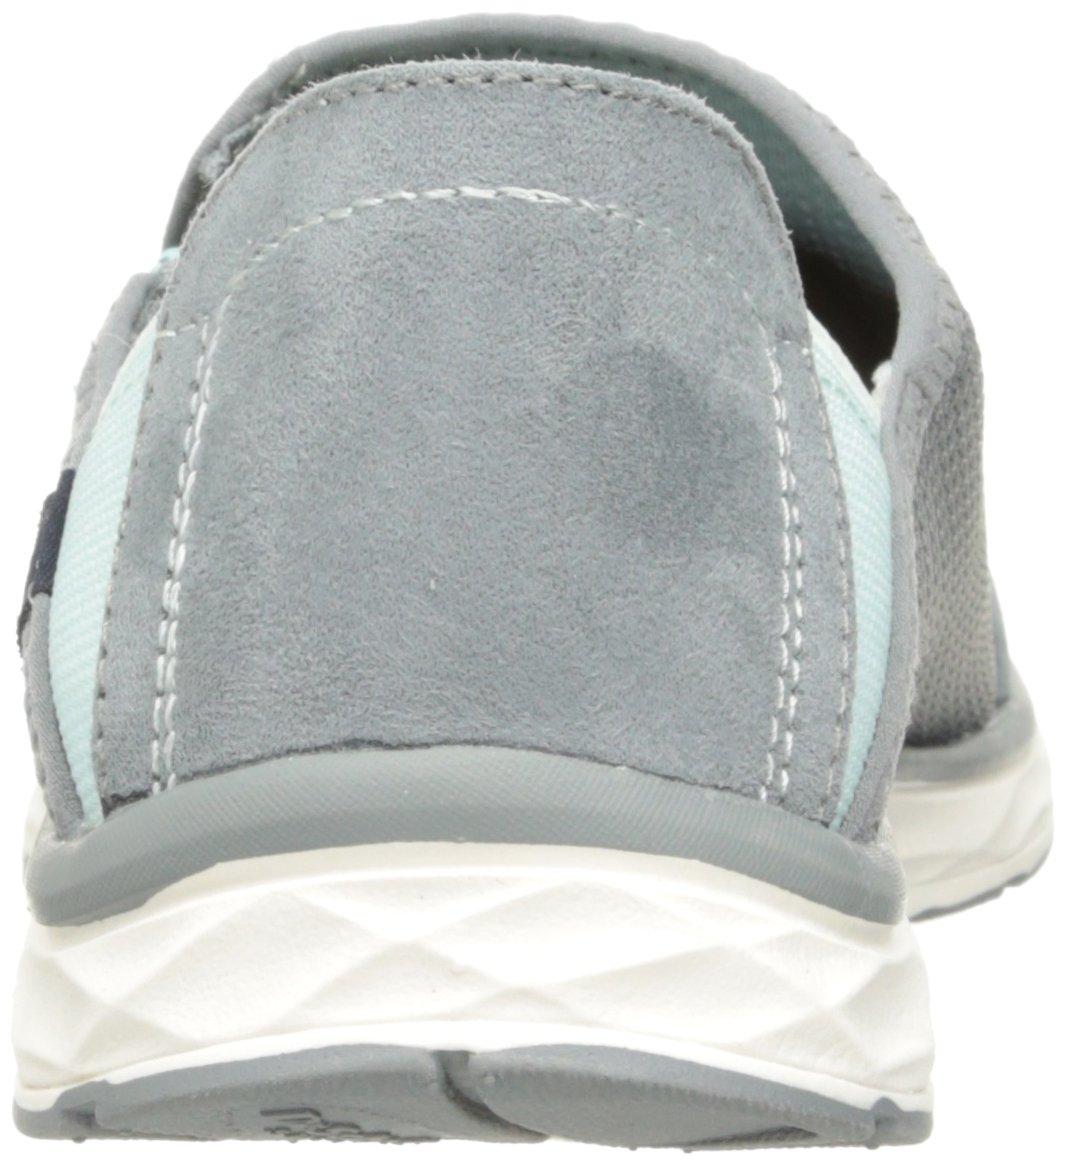 Dr. Scholl's Women's Anna Zip Fashion Sneaker B01KG9V3GO 6 B(M) US|Monument Luna Knit